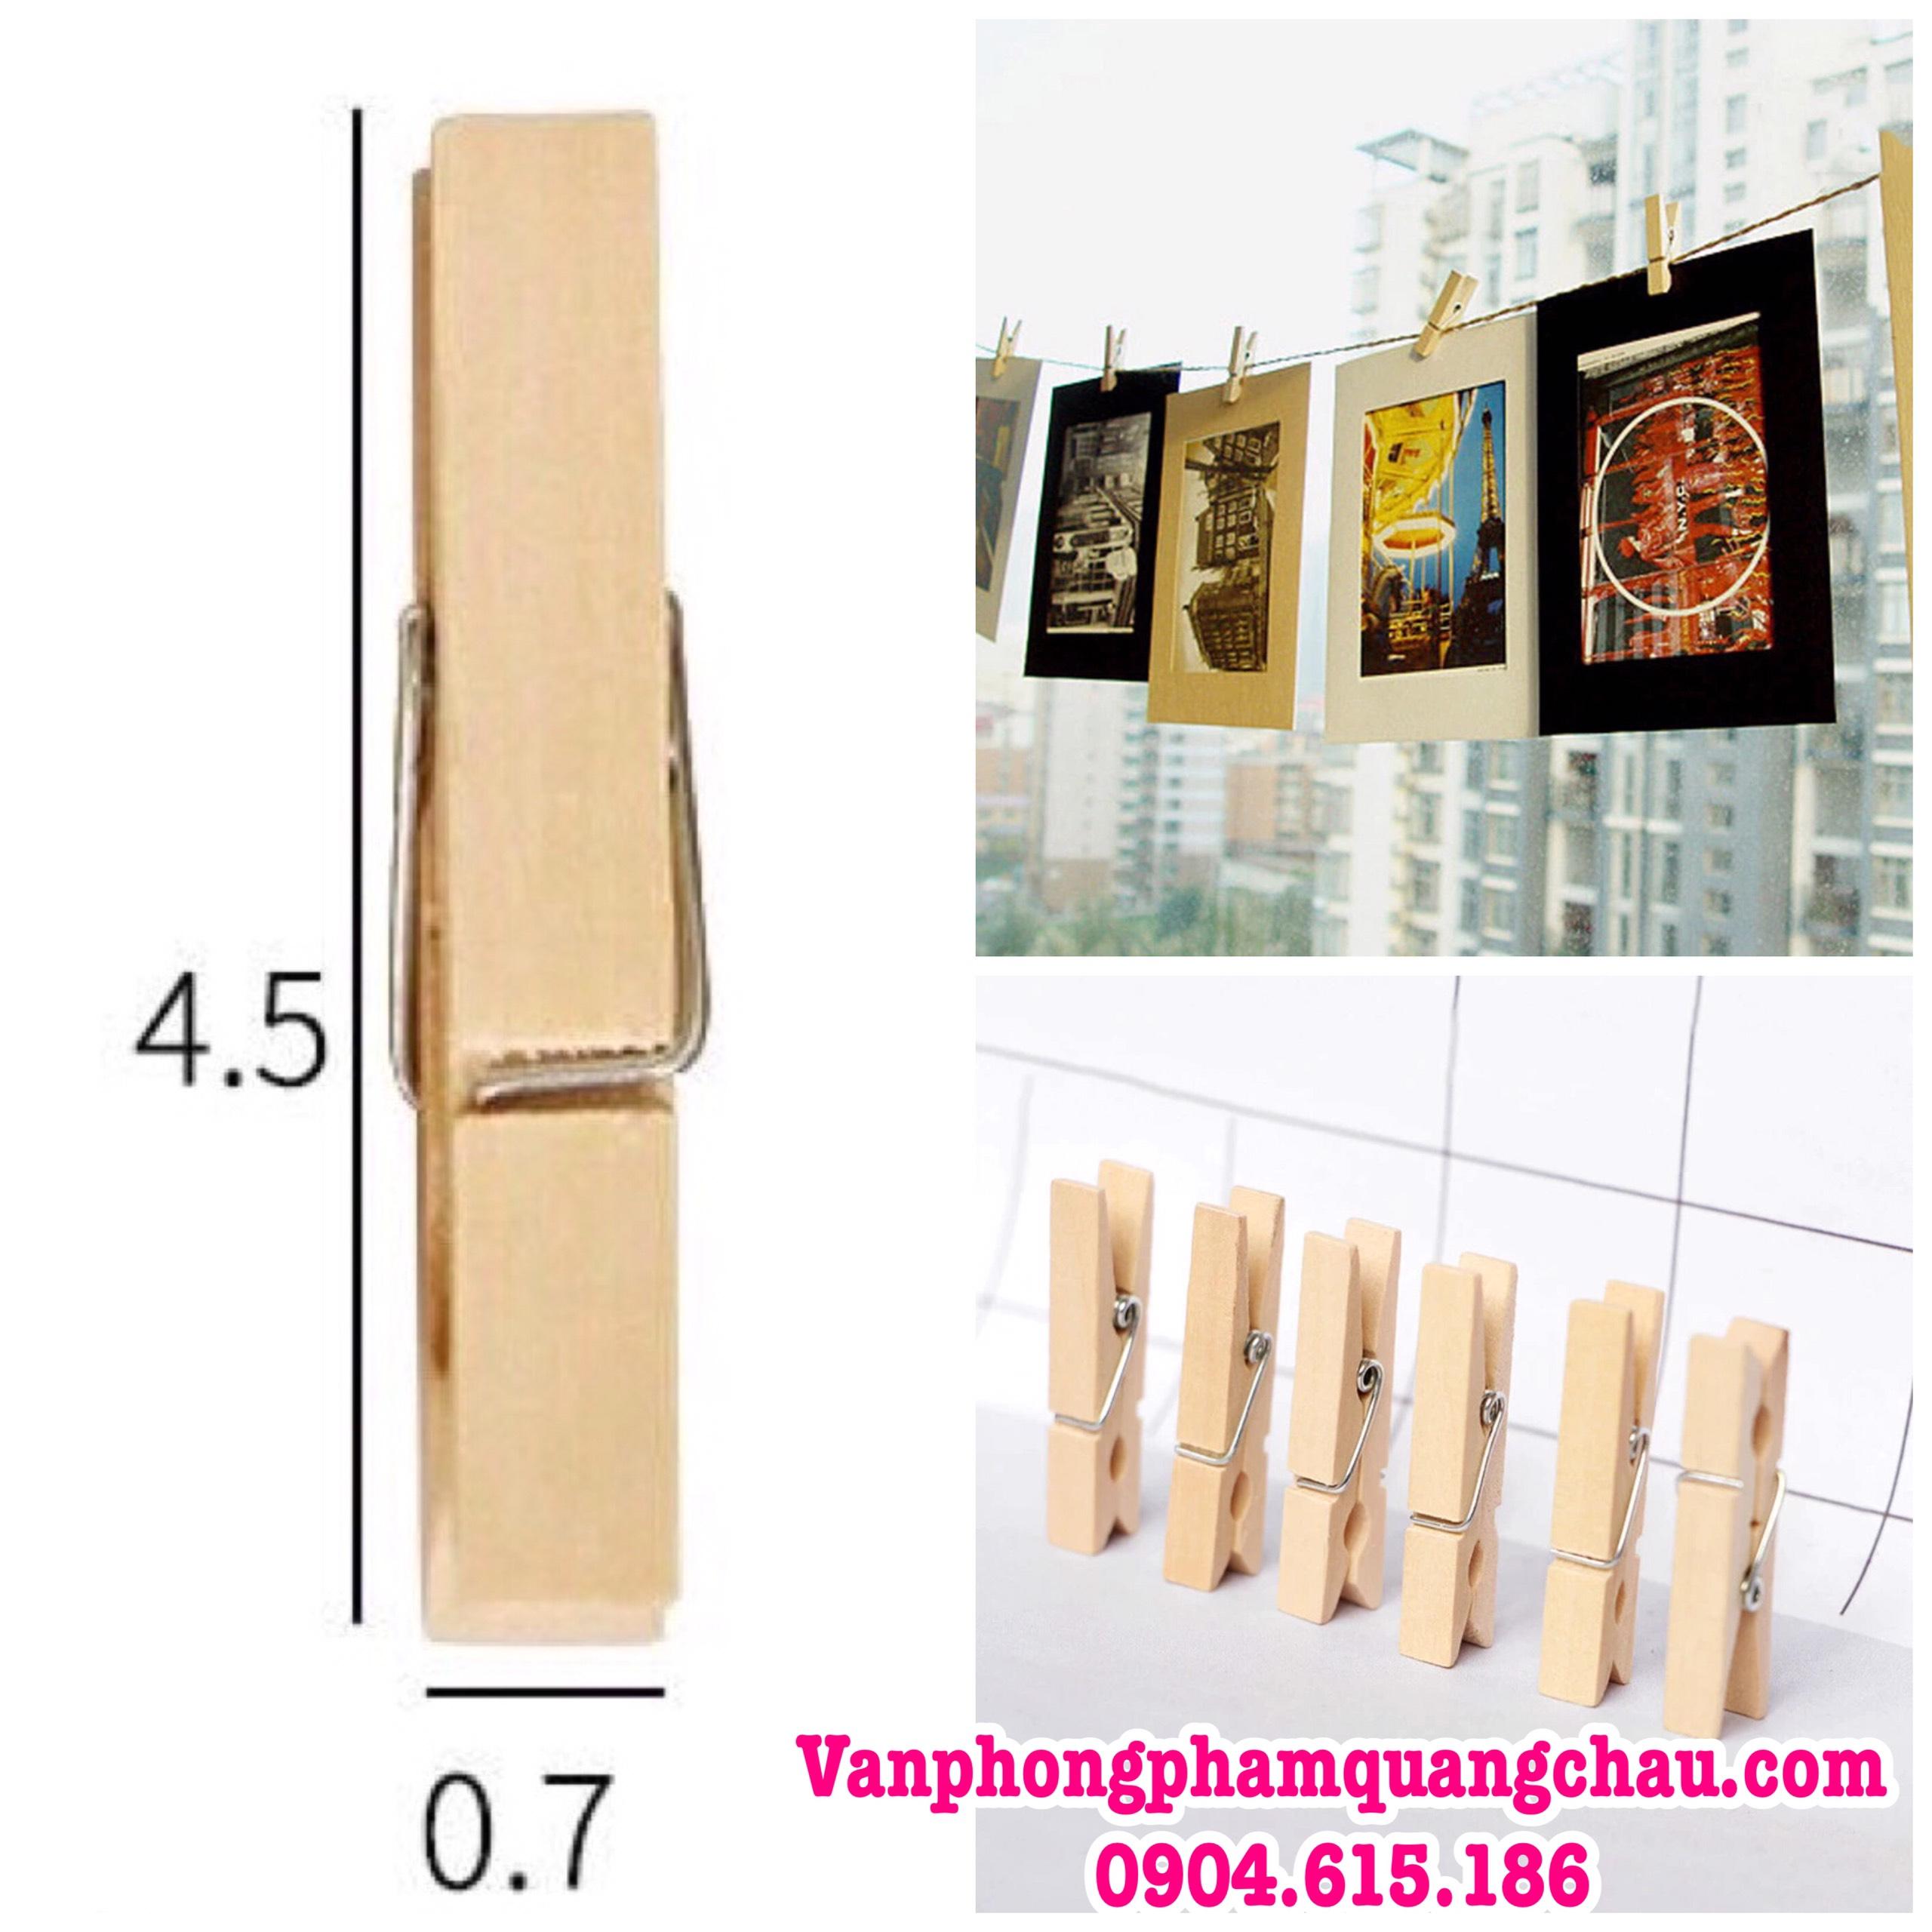 Kẹp gỗ trơn handmade (size 4.5cm x 7mm) - Set 10 chiếc_G019